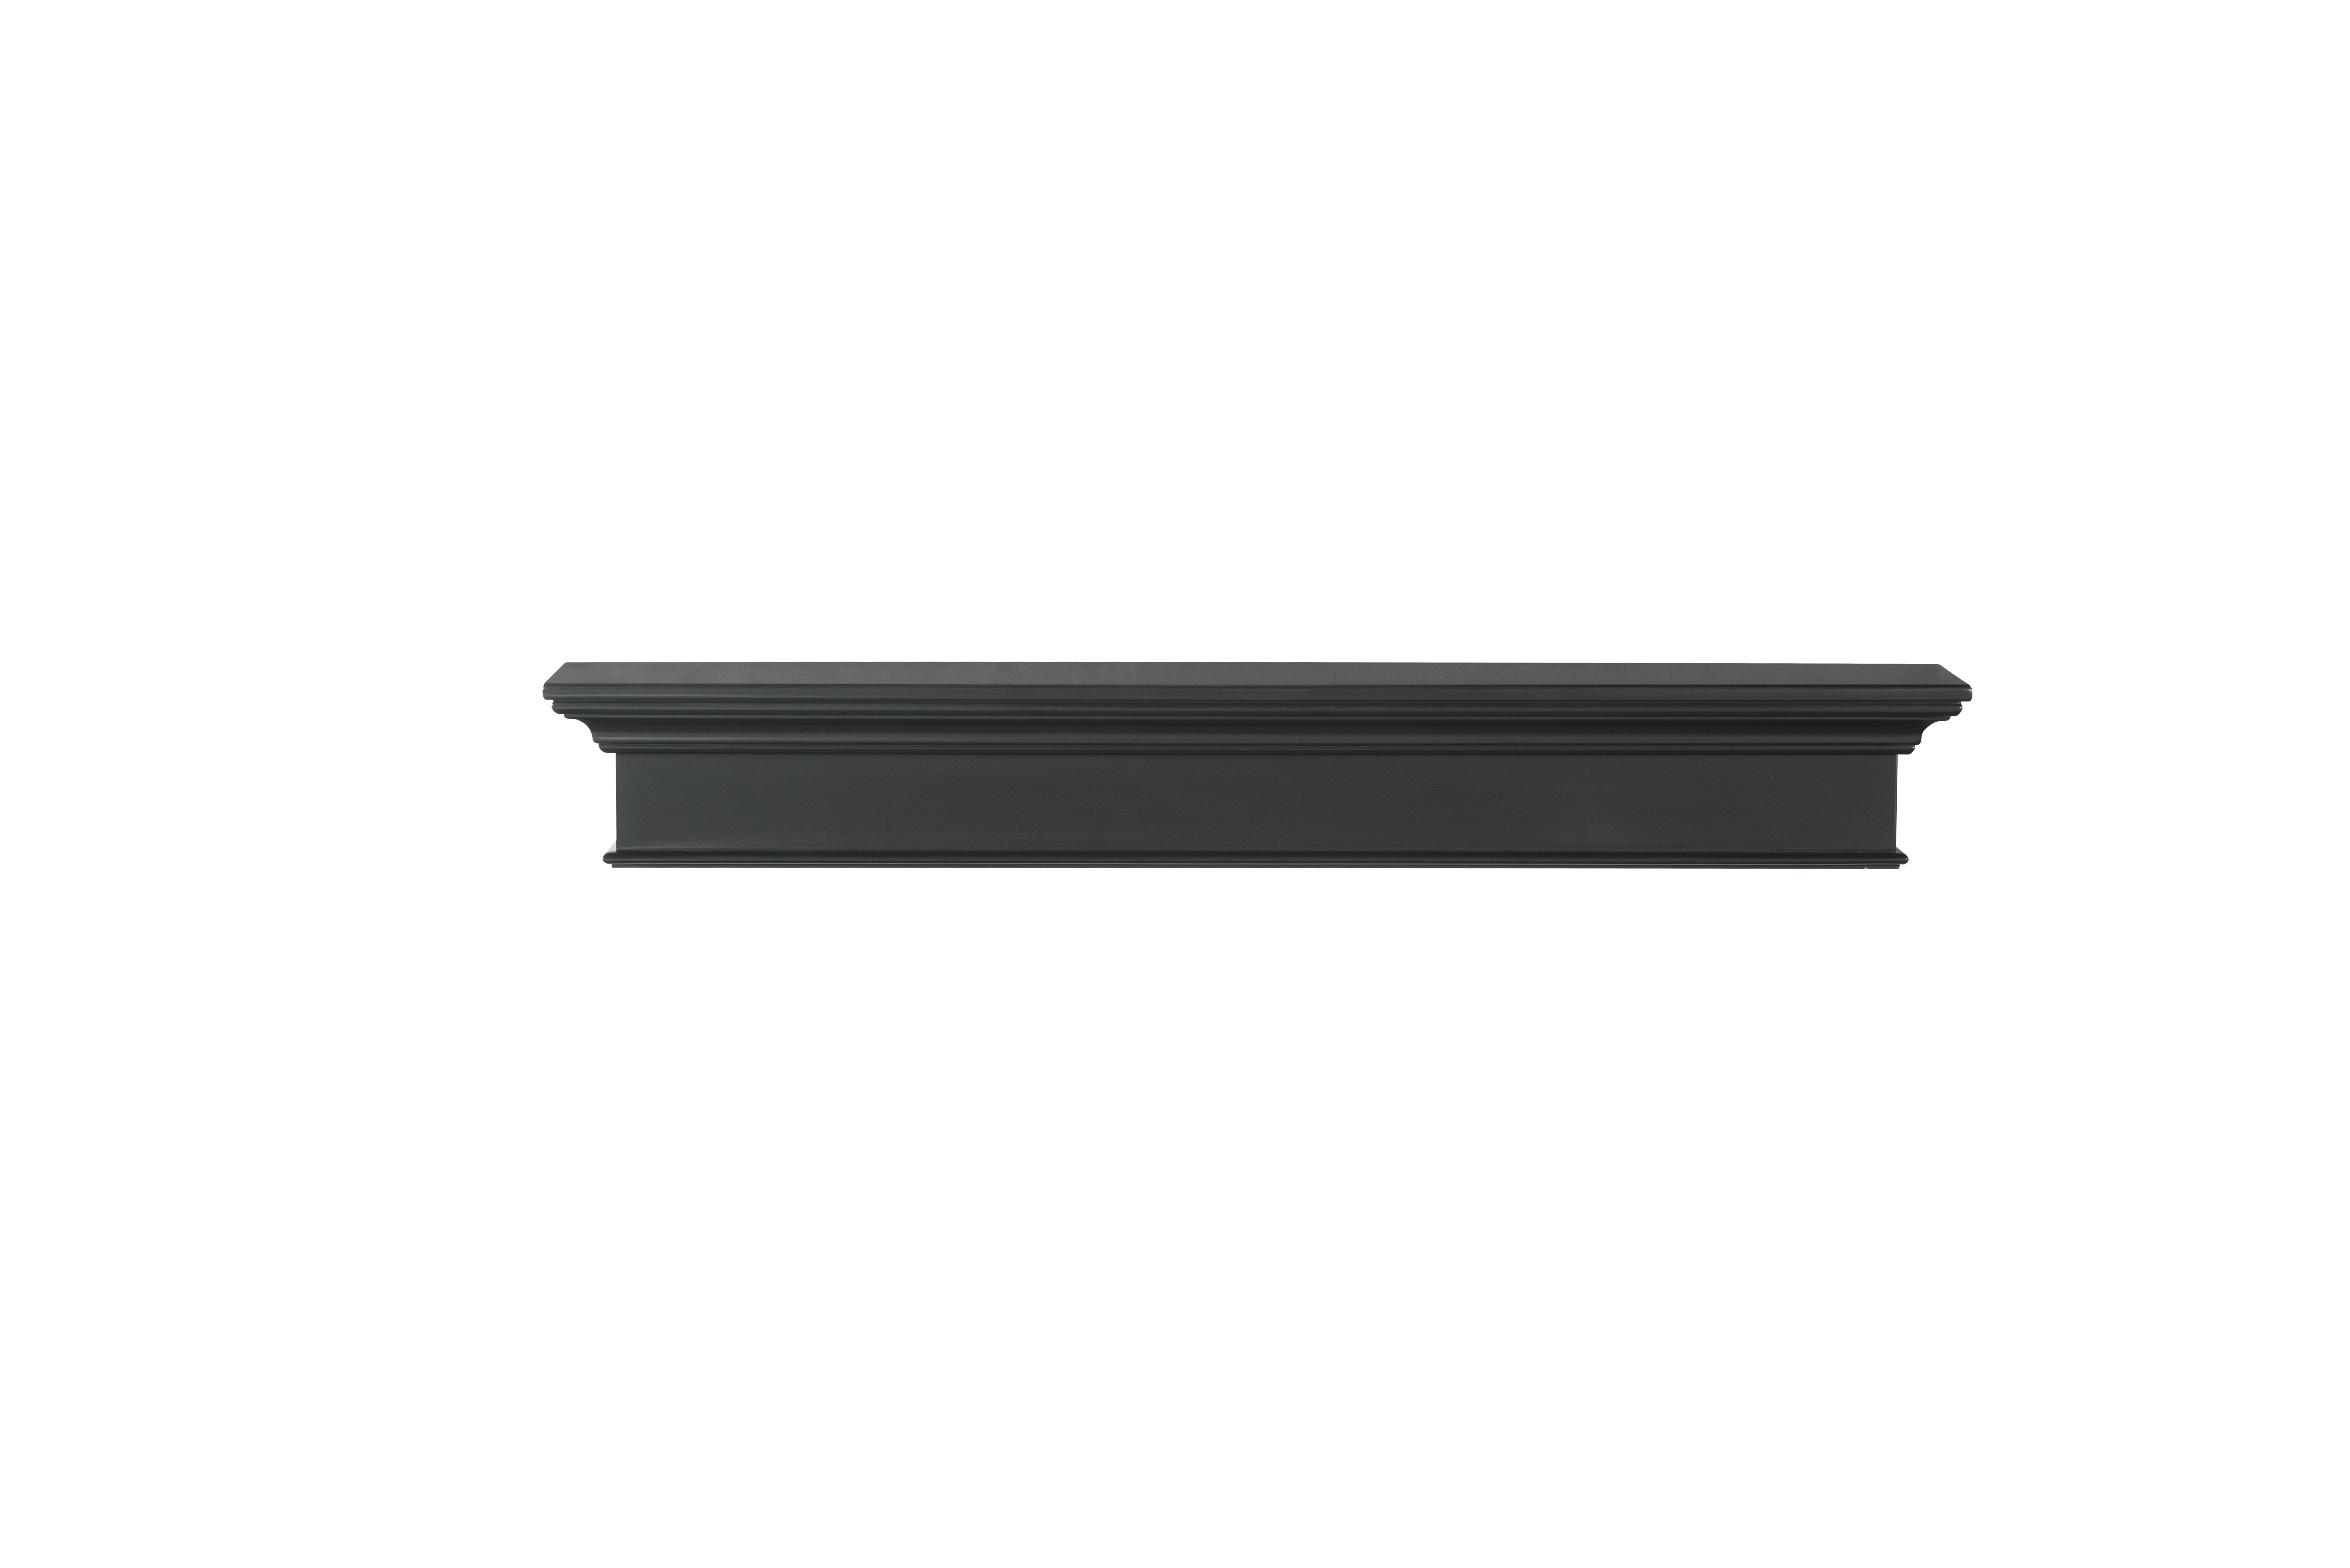 The Henry 610-BLK Black Painted Fireplace Mantel Shelf